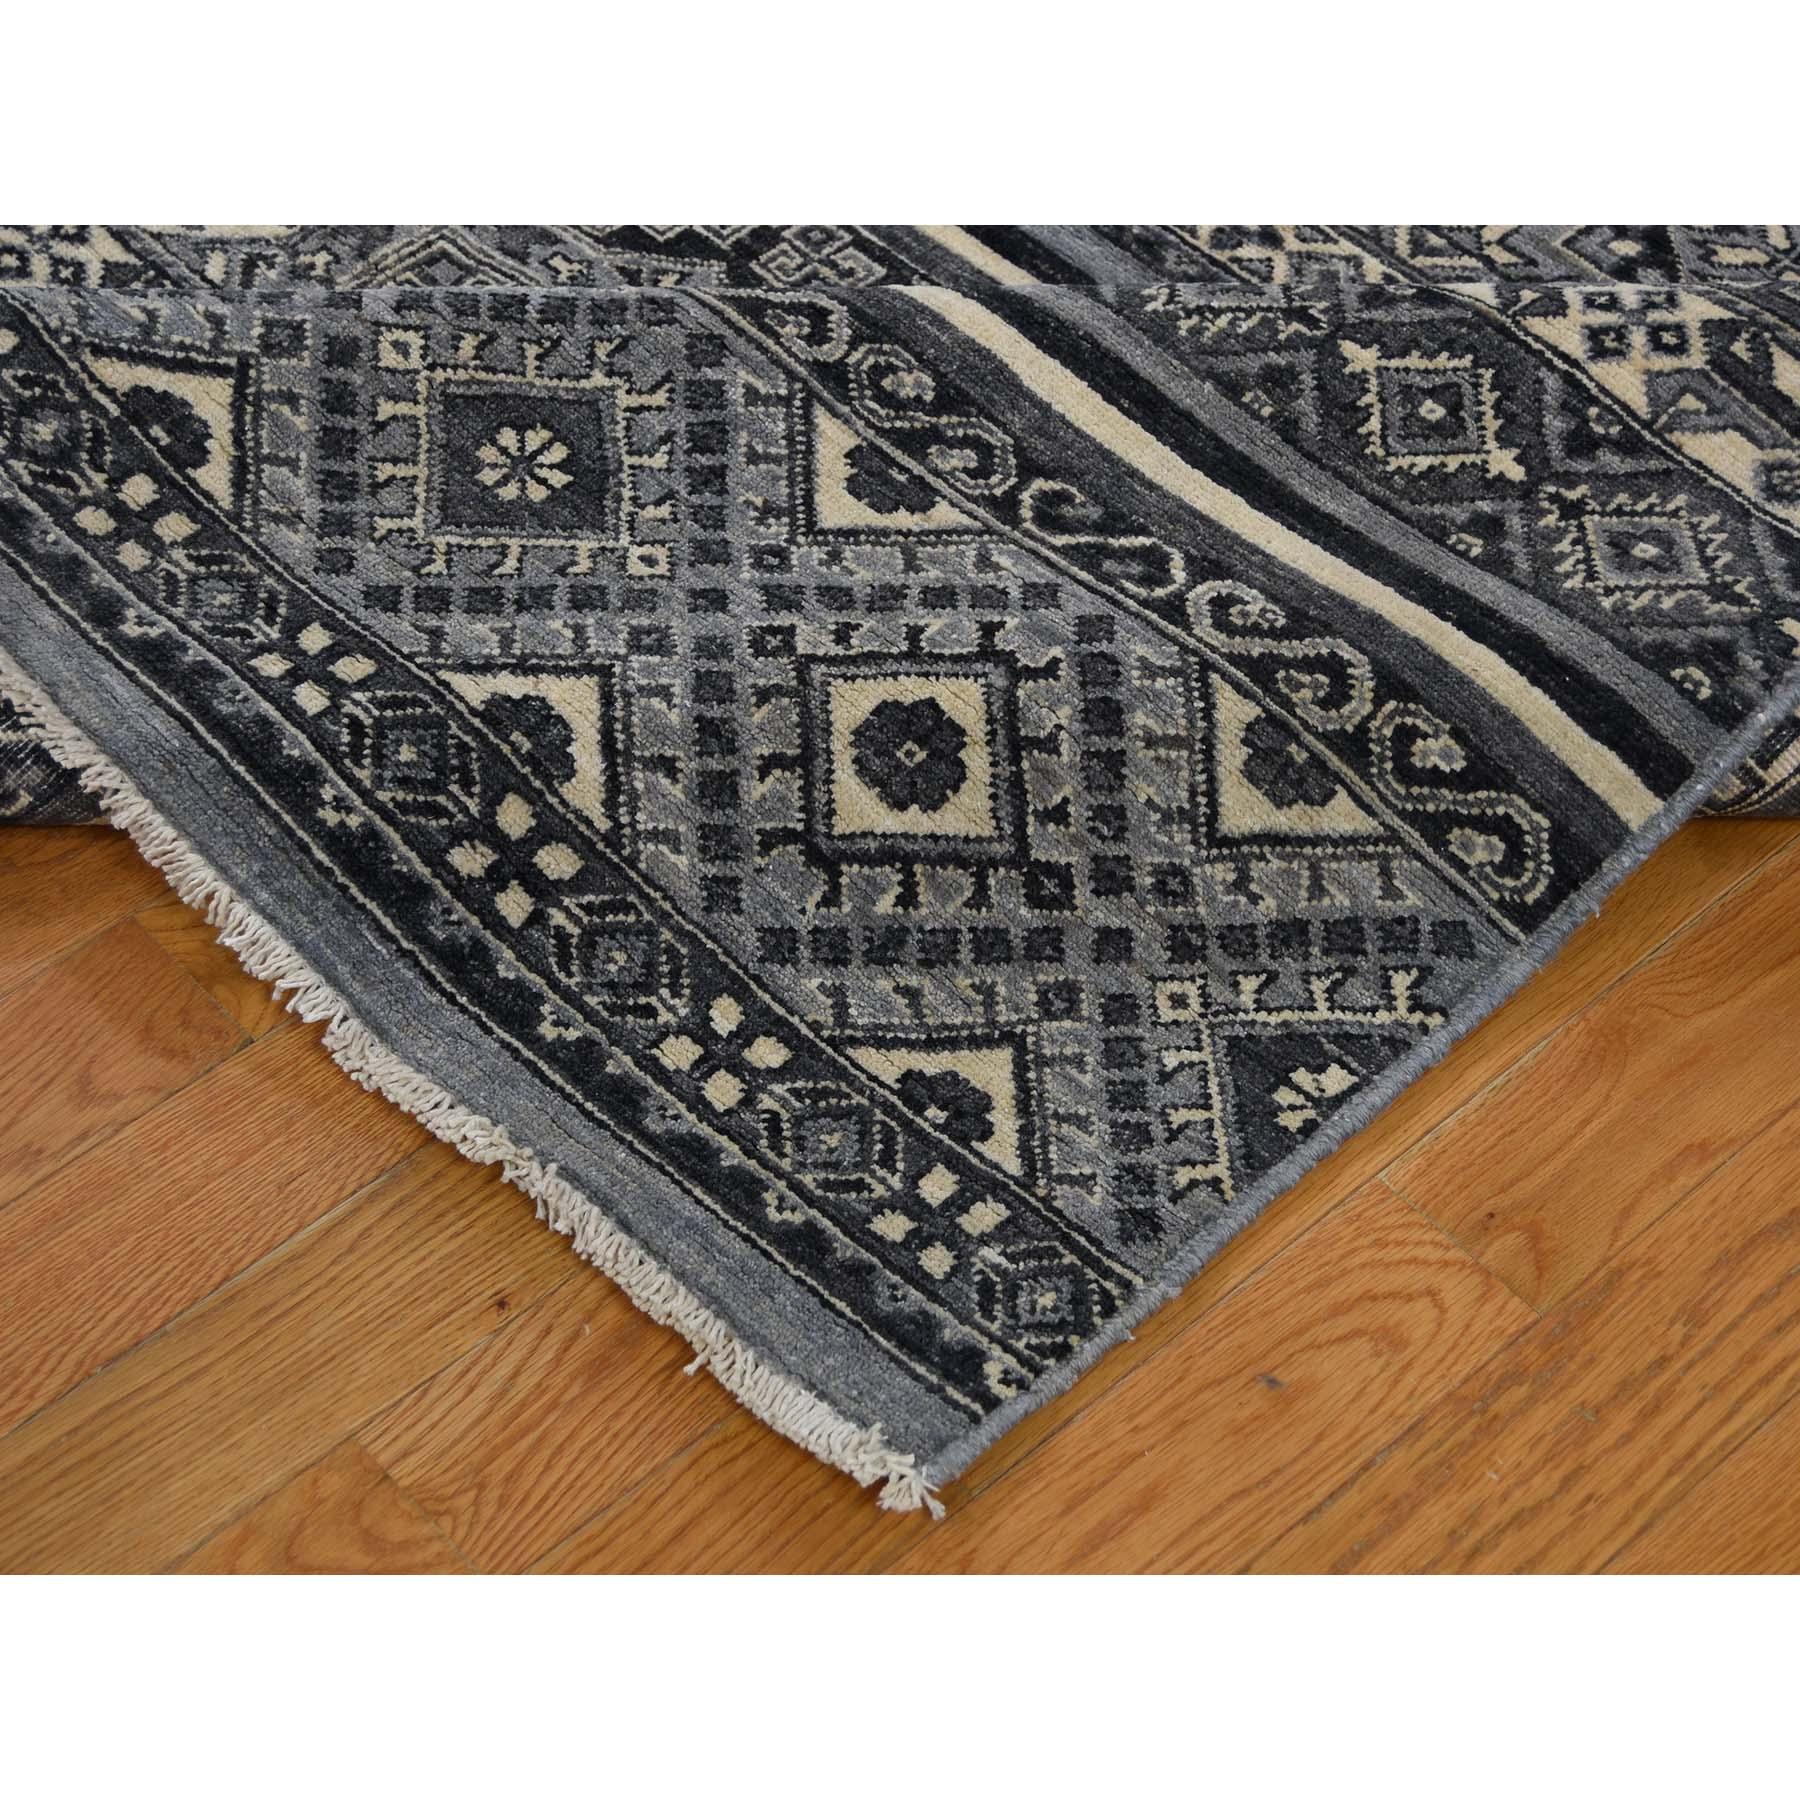 10-x13-5  Khorjin Design Super Kazak Hand-Knotted Pure Wool Oriental Rug